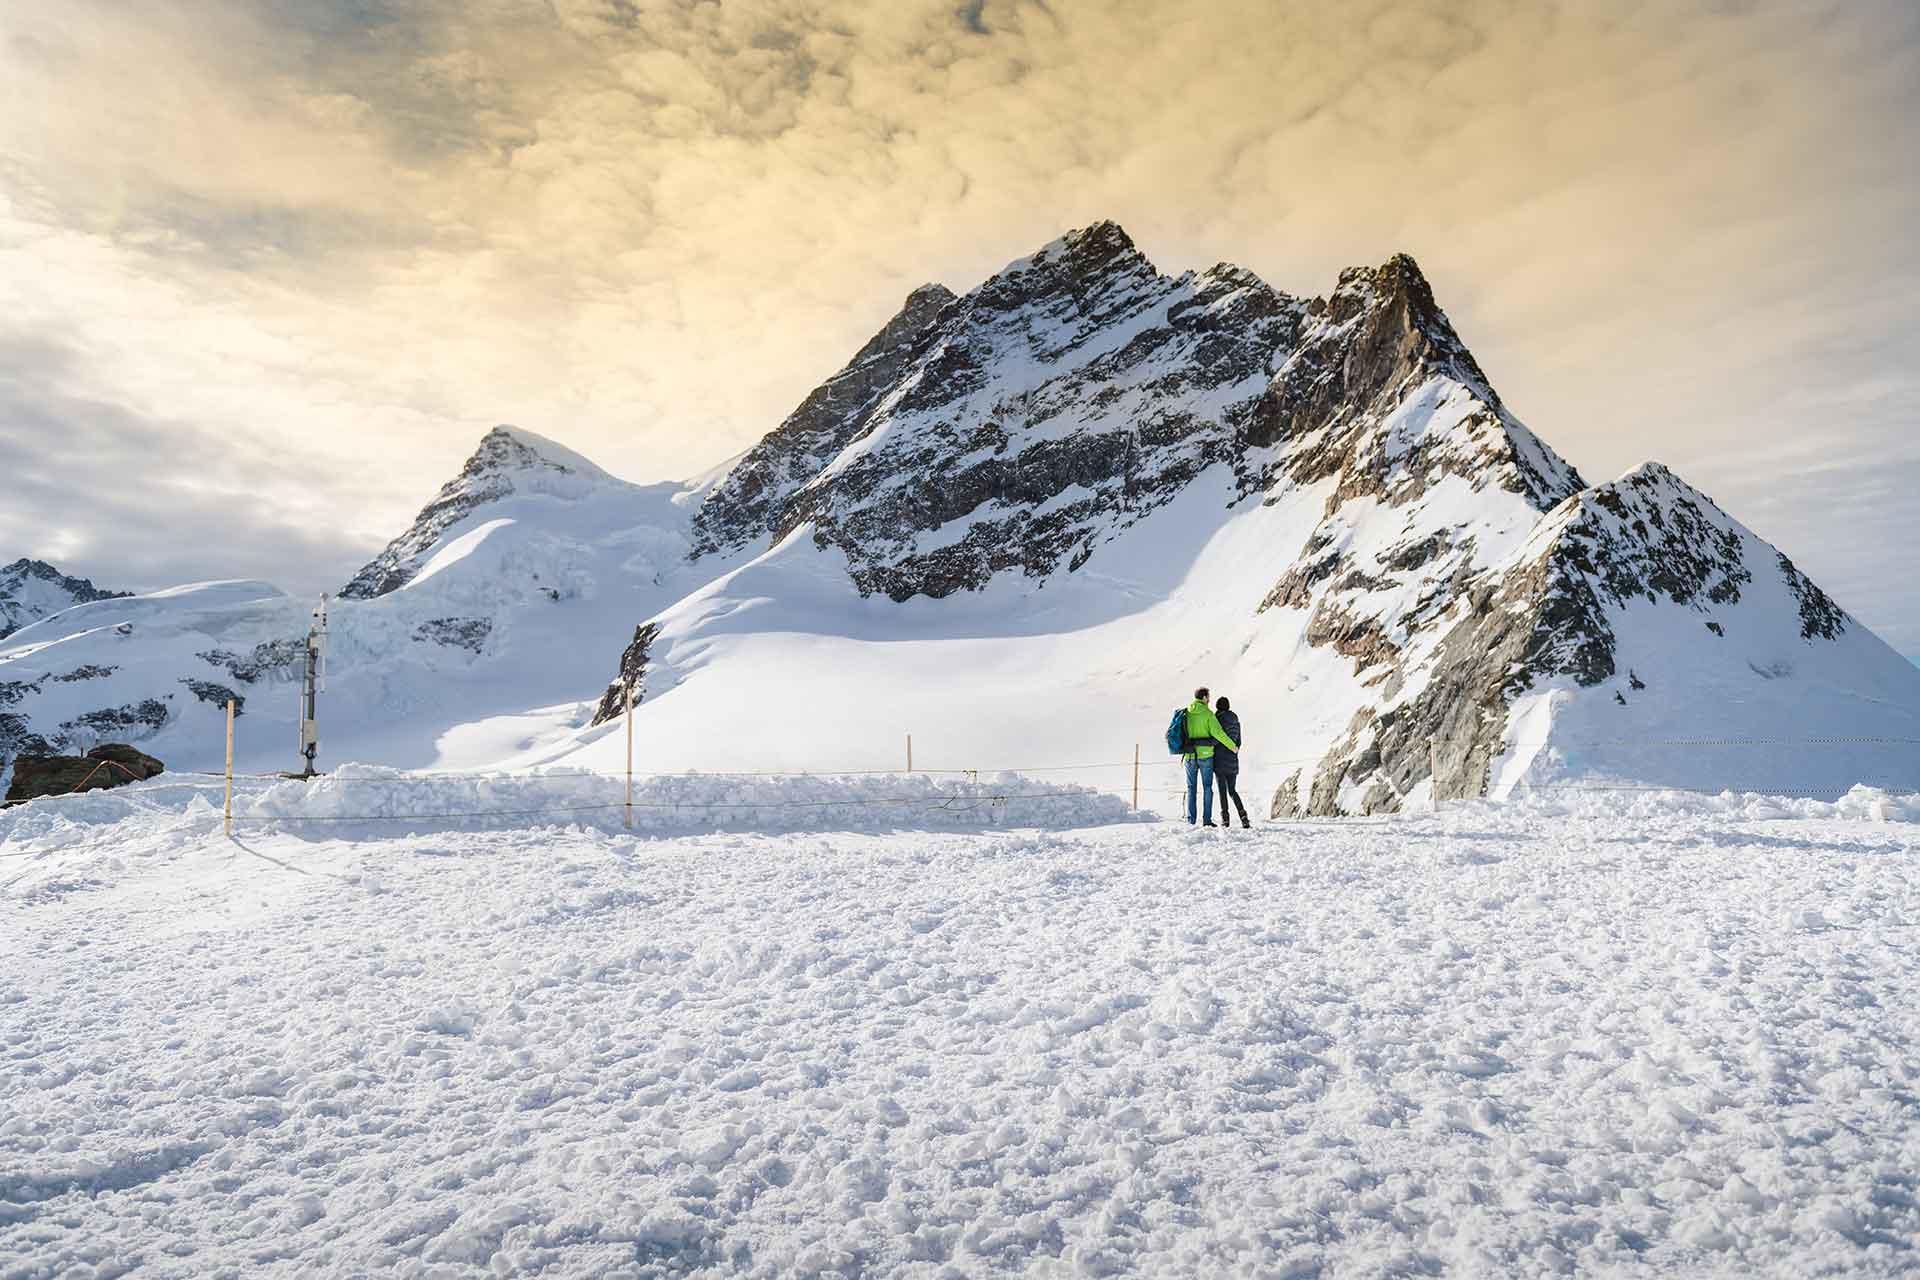 Photographer Jungfraujoch in the Swiss Alps